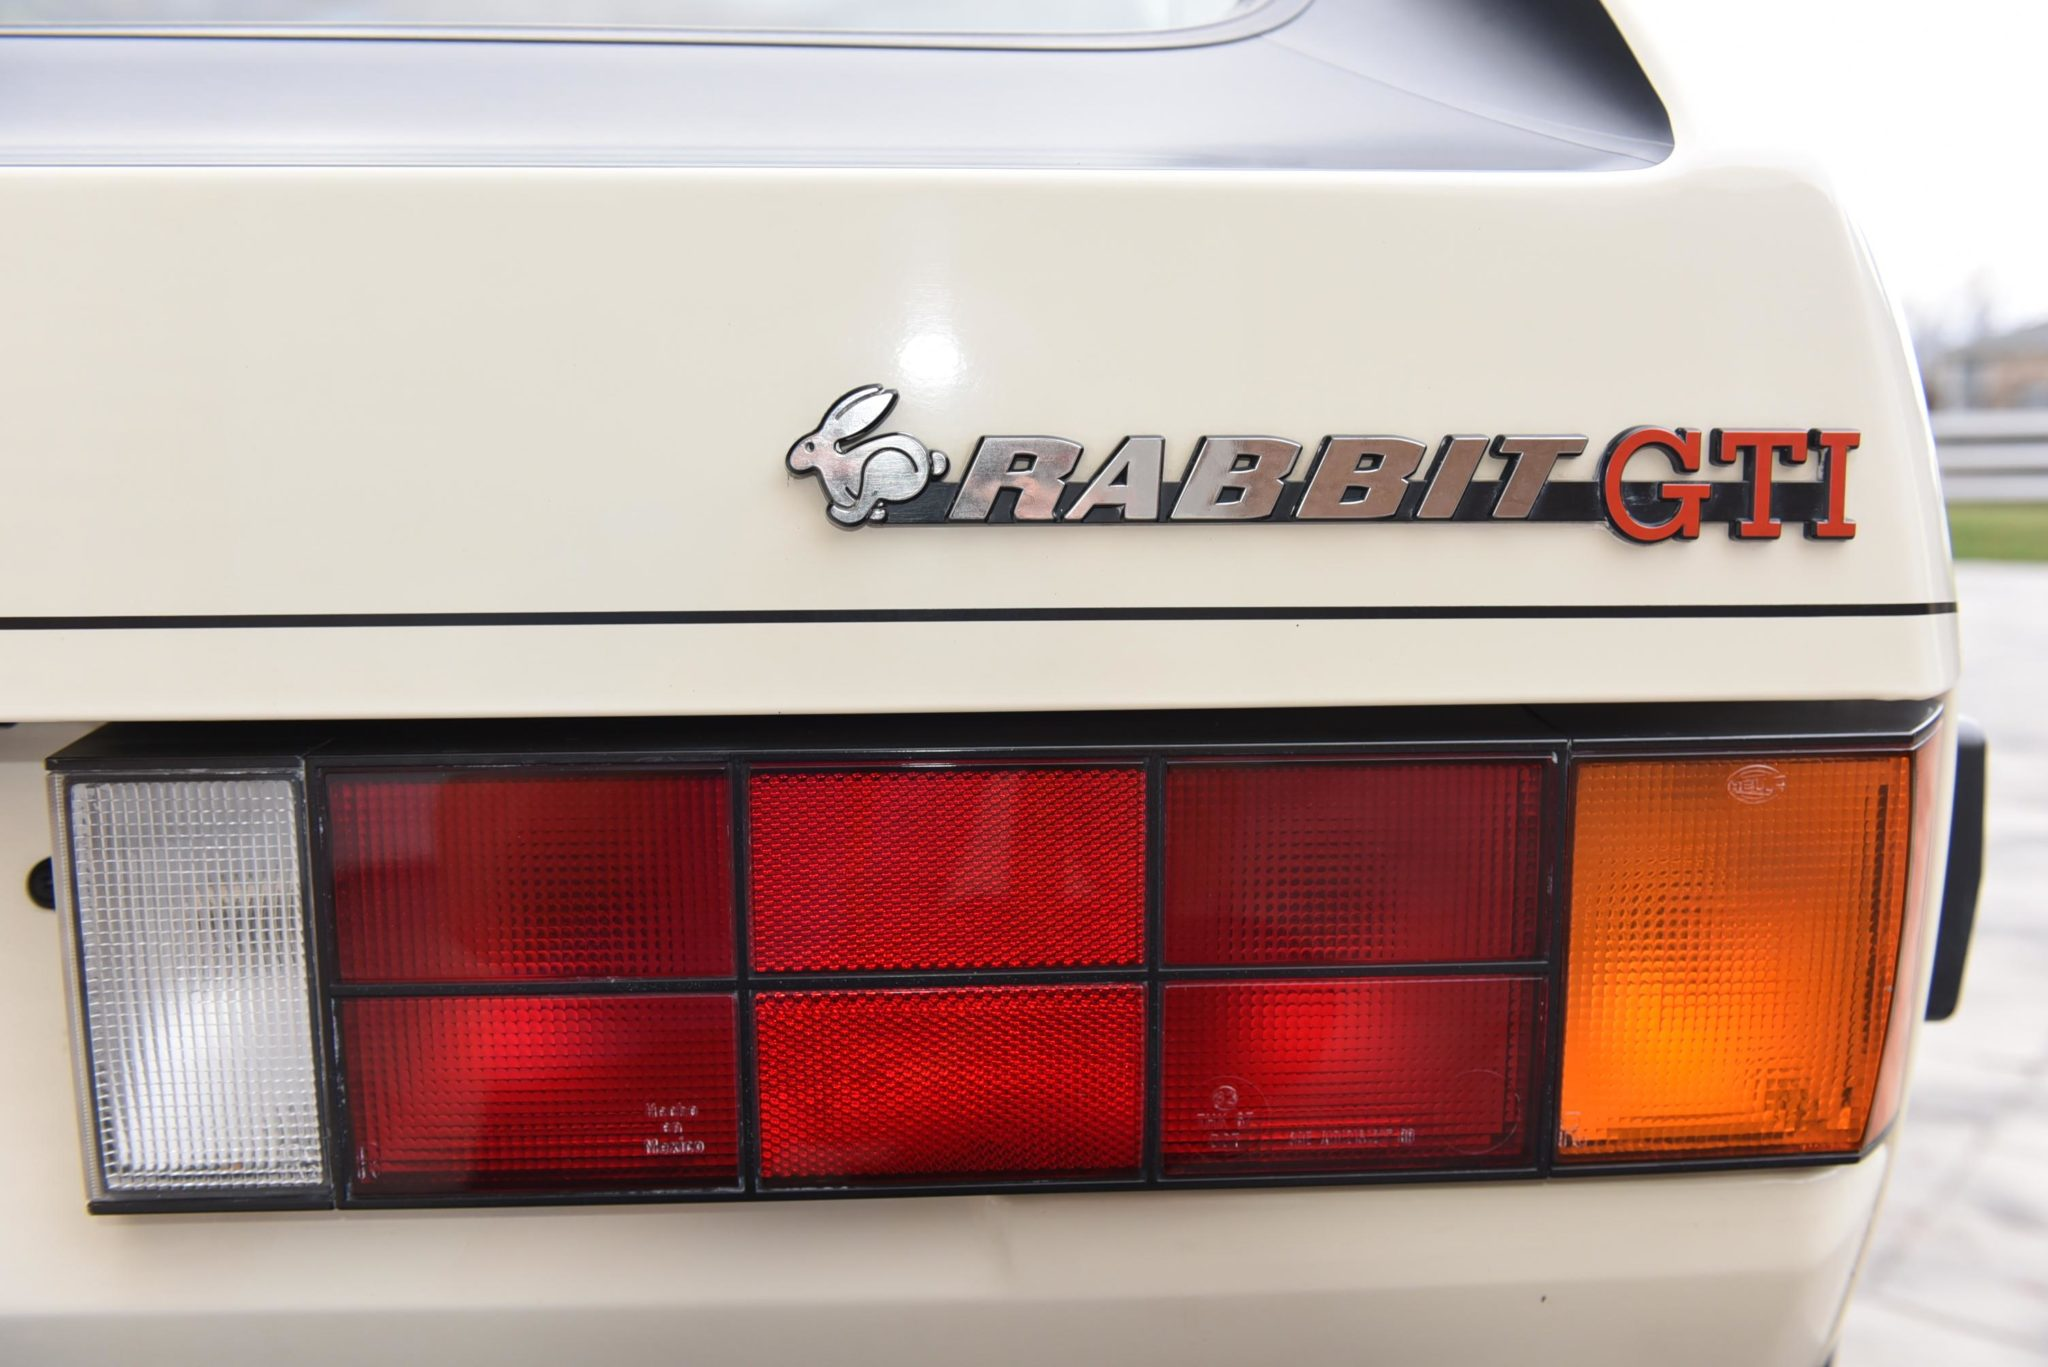 1983_volkswagen_rabbit_gti_1587038741114e7b9c27f8dLEM_9921-scaled